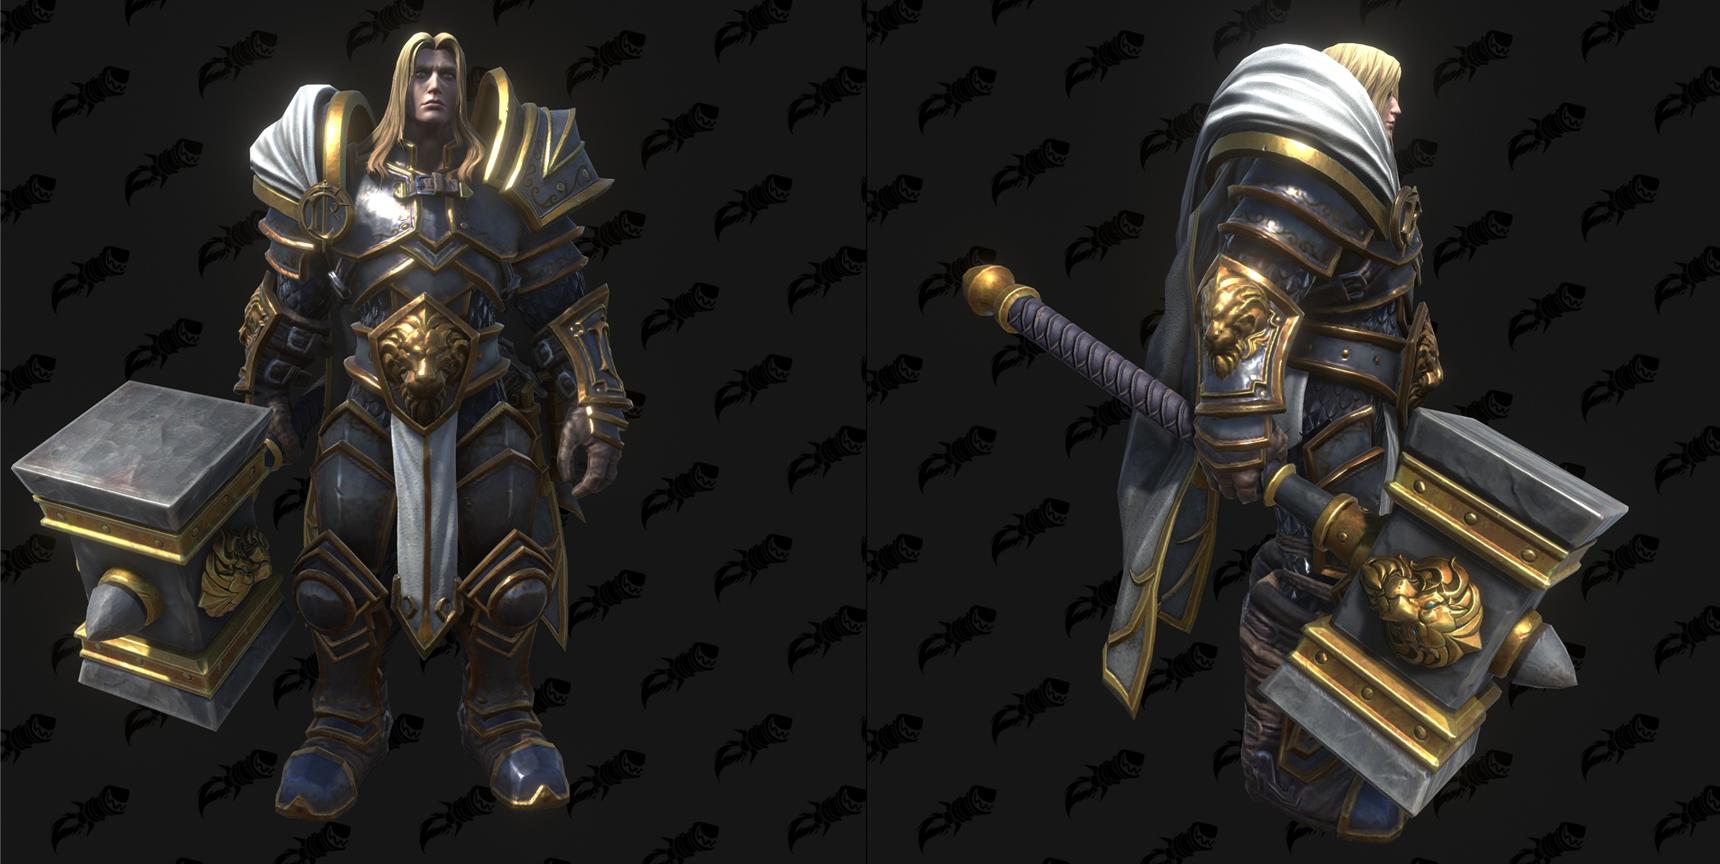 Modèle Warcraft III Reforged : Arthas